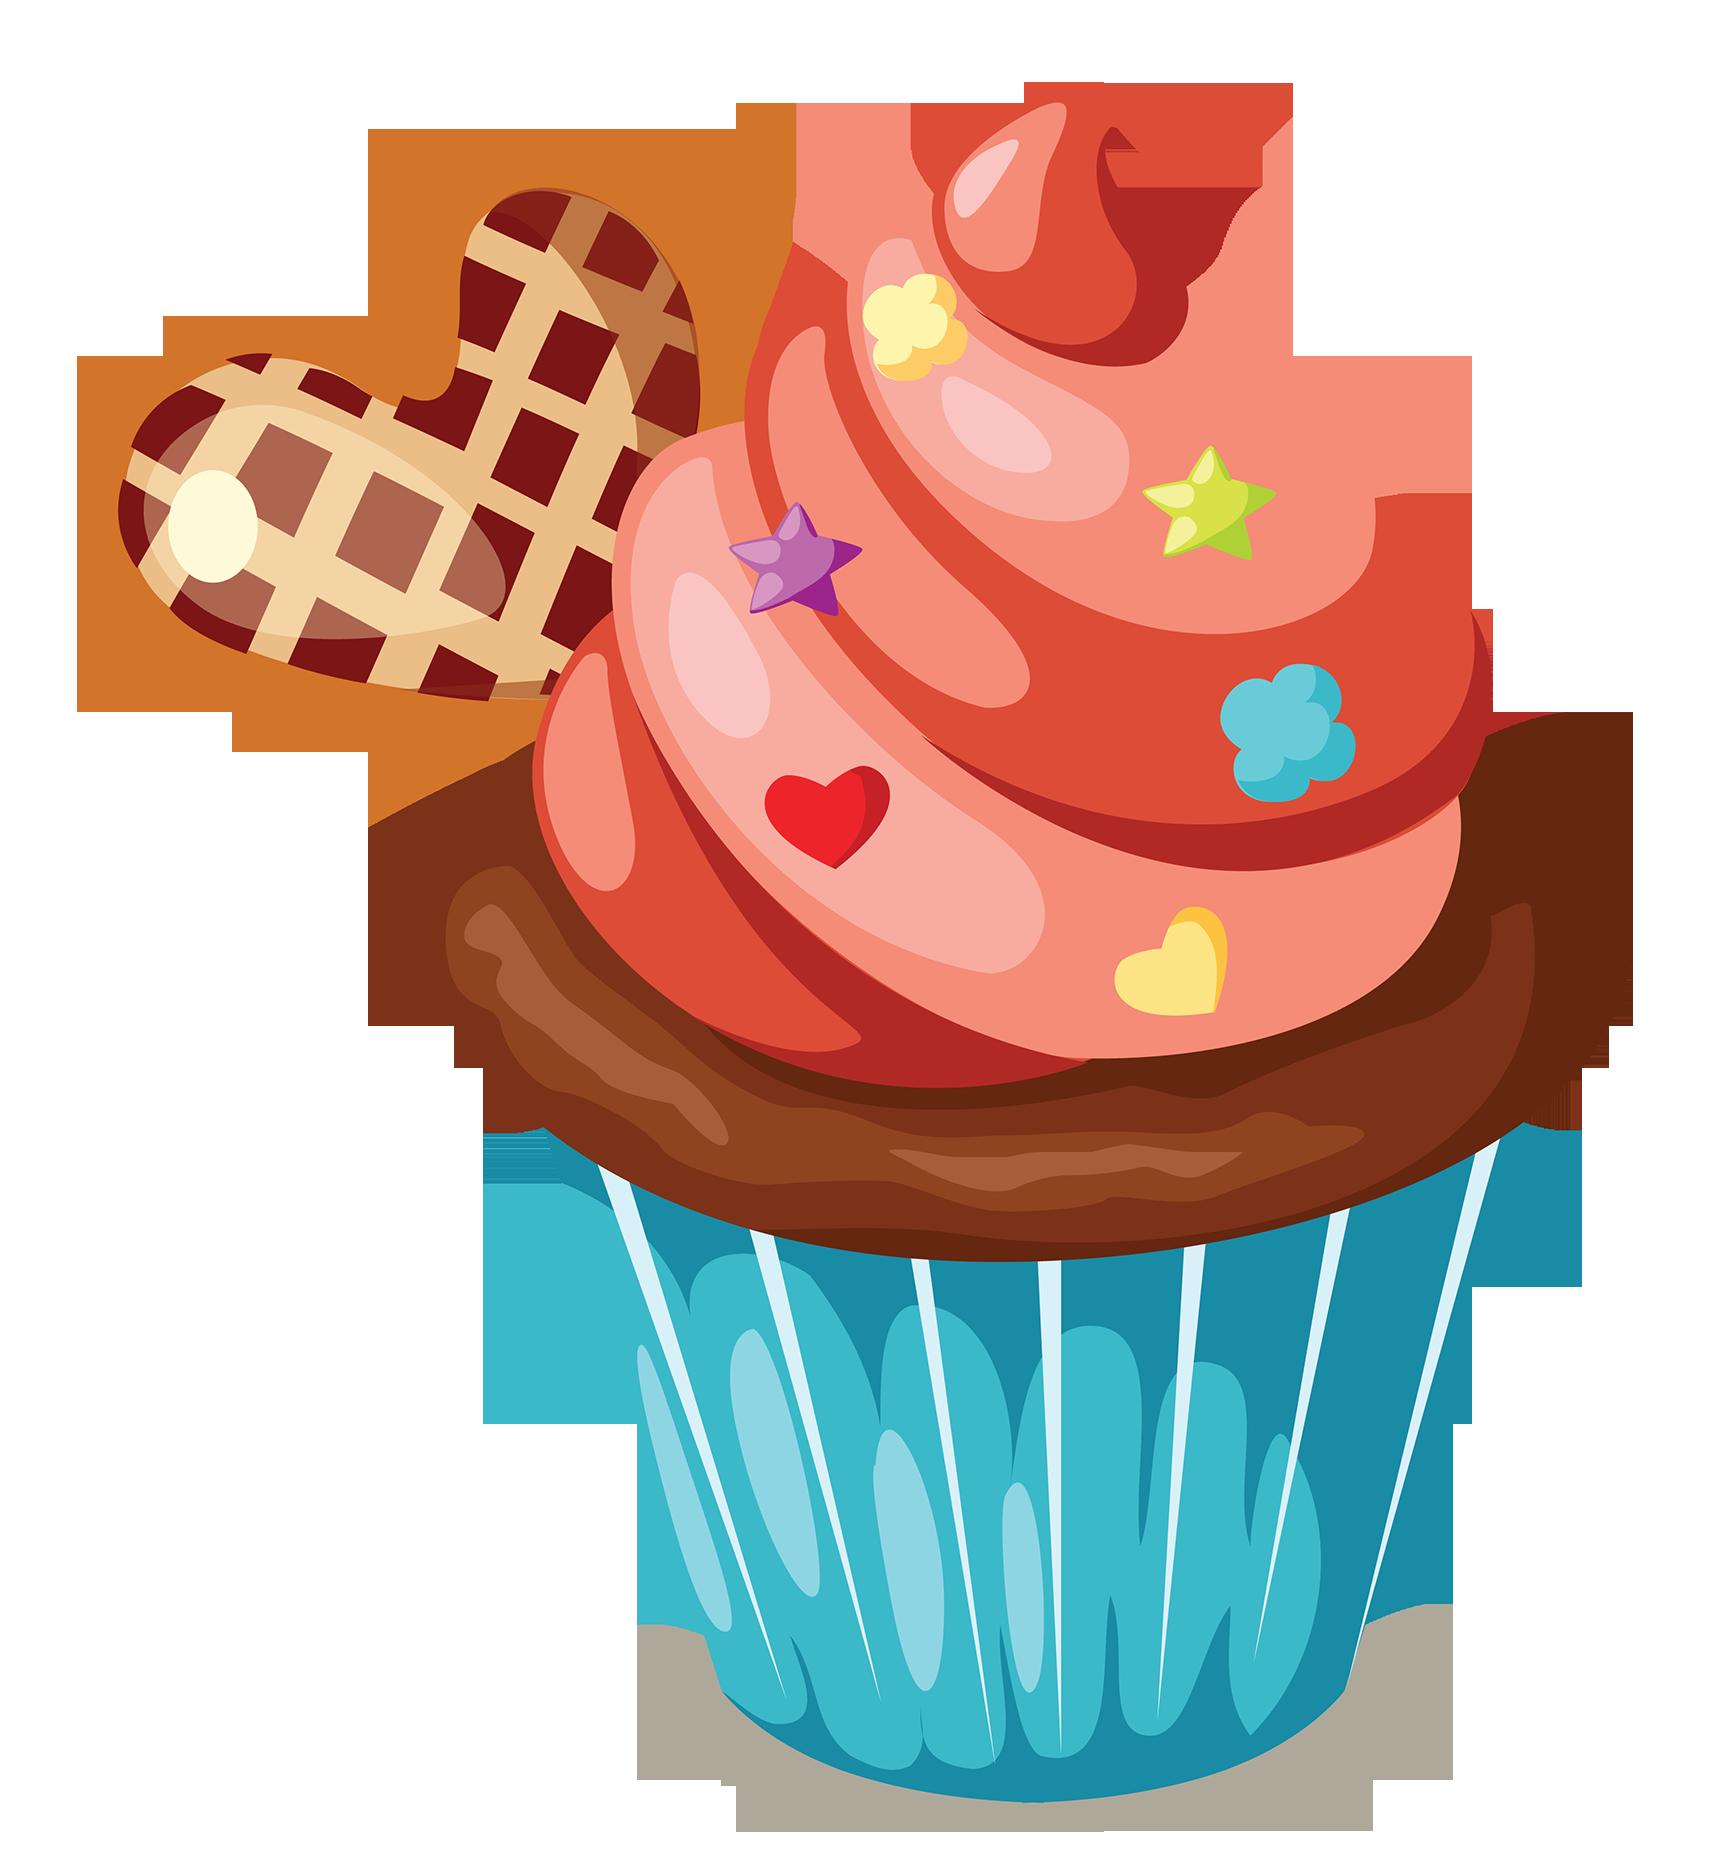 Watermelon clipart cupcake. Icing birthday cake muffin